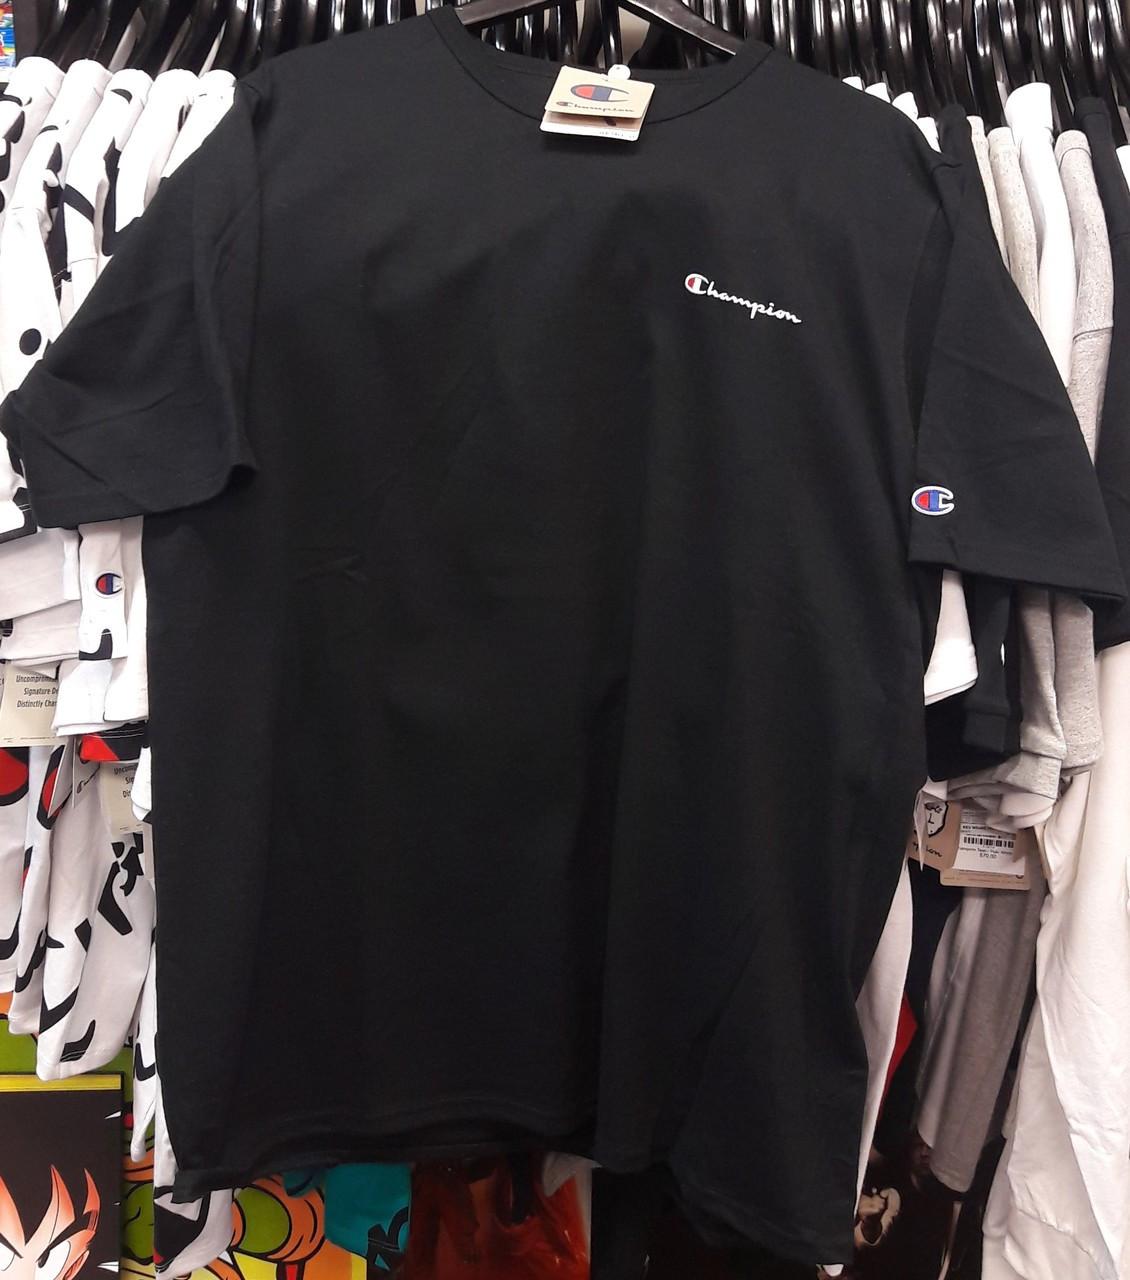 9363363b029 Champion Heritage Small Script Black T-Shirt - Authentic Champion ...